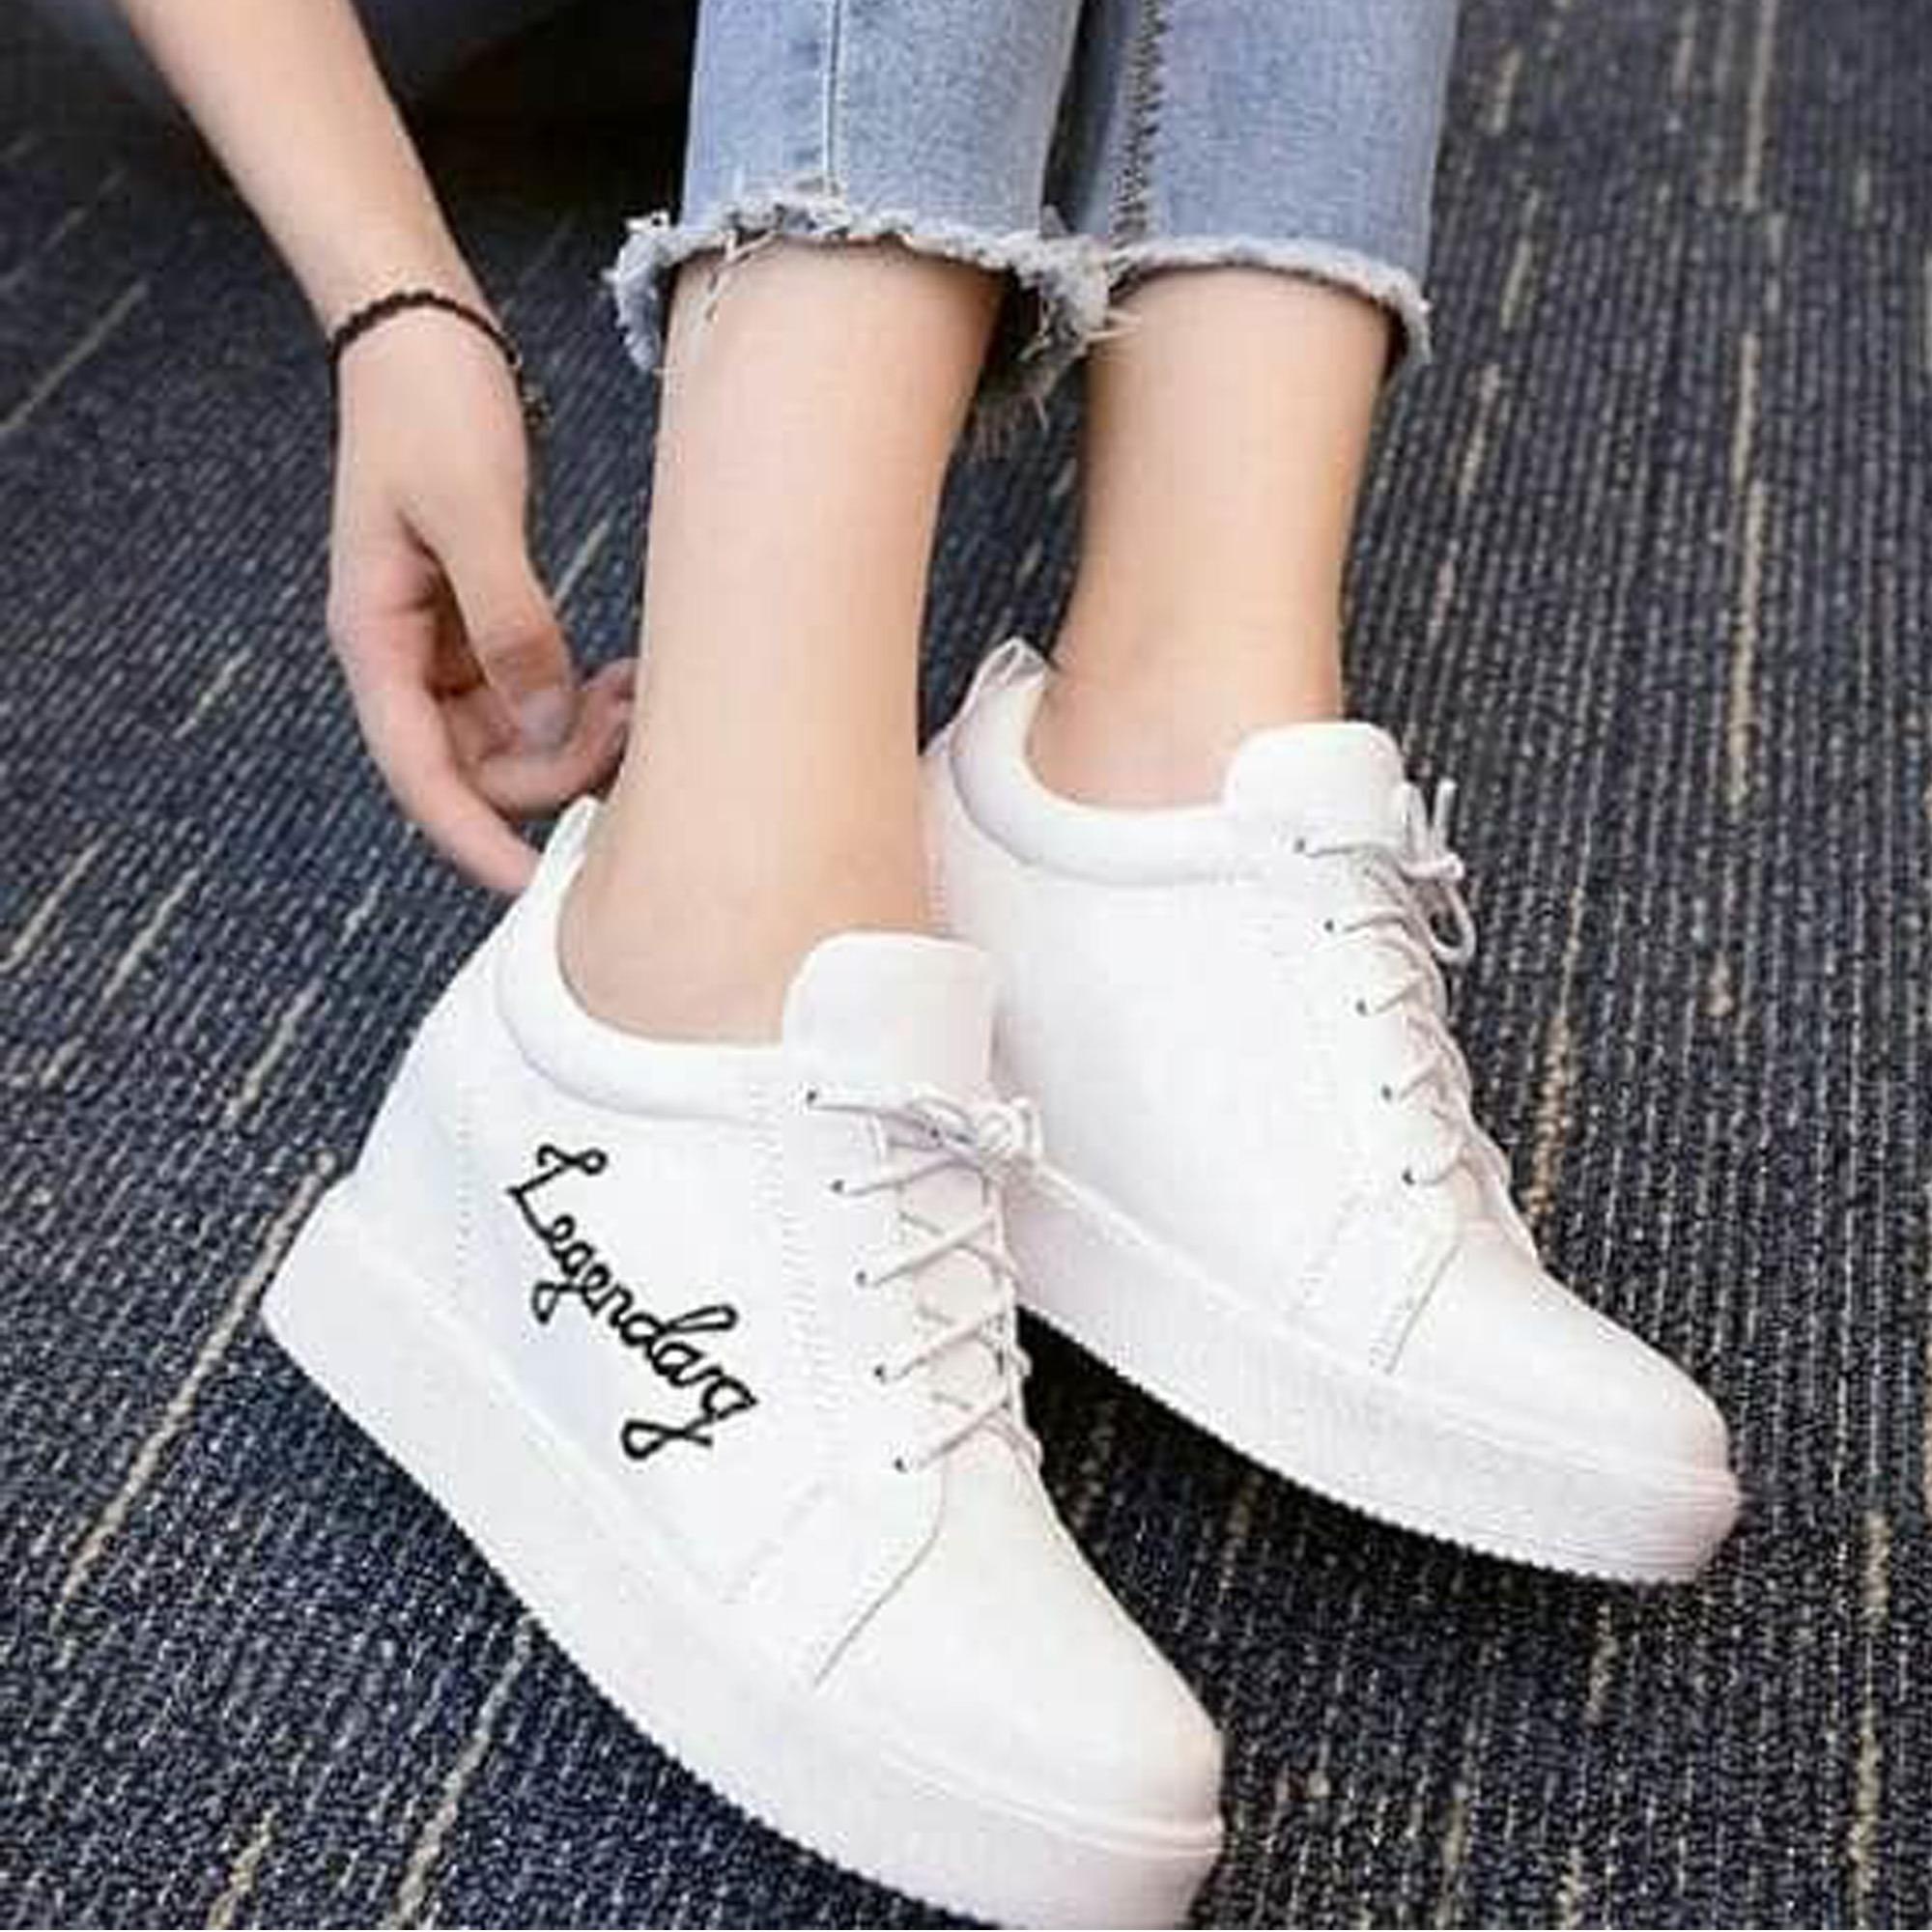 Femine - Sepatu Wanita Boots Legendary LG01 - Putih